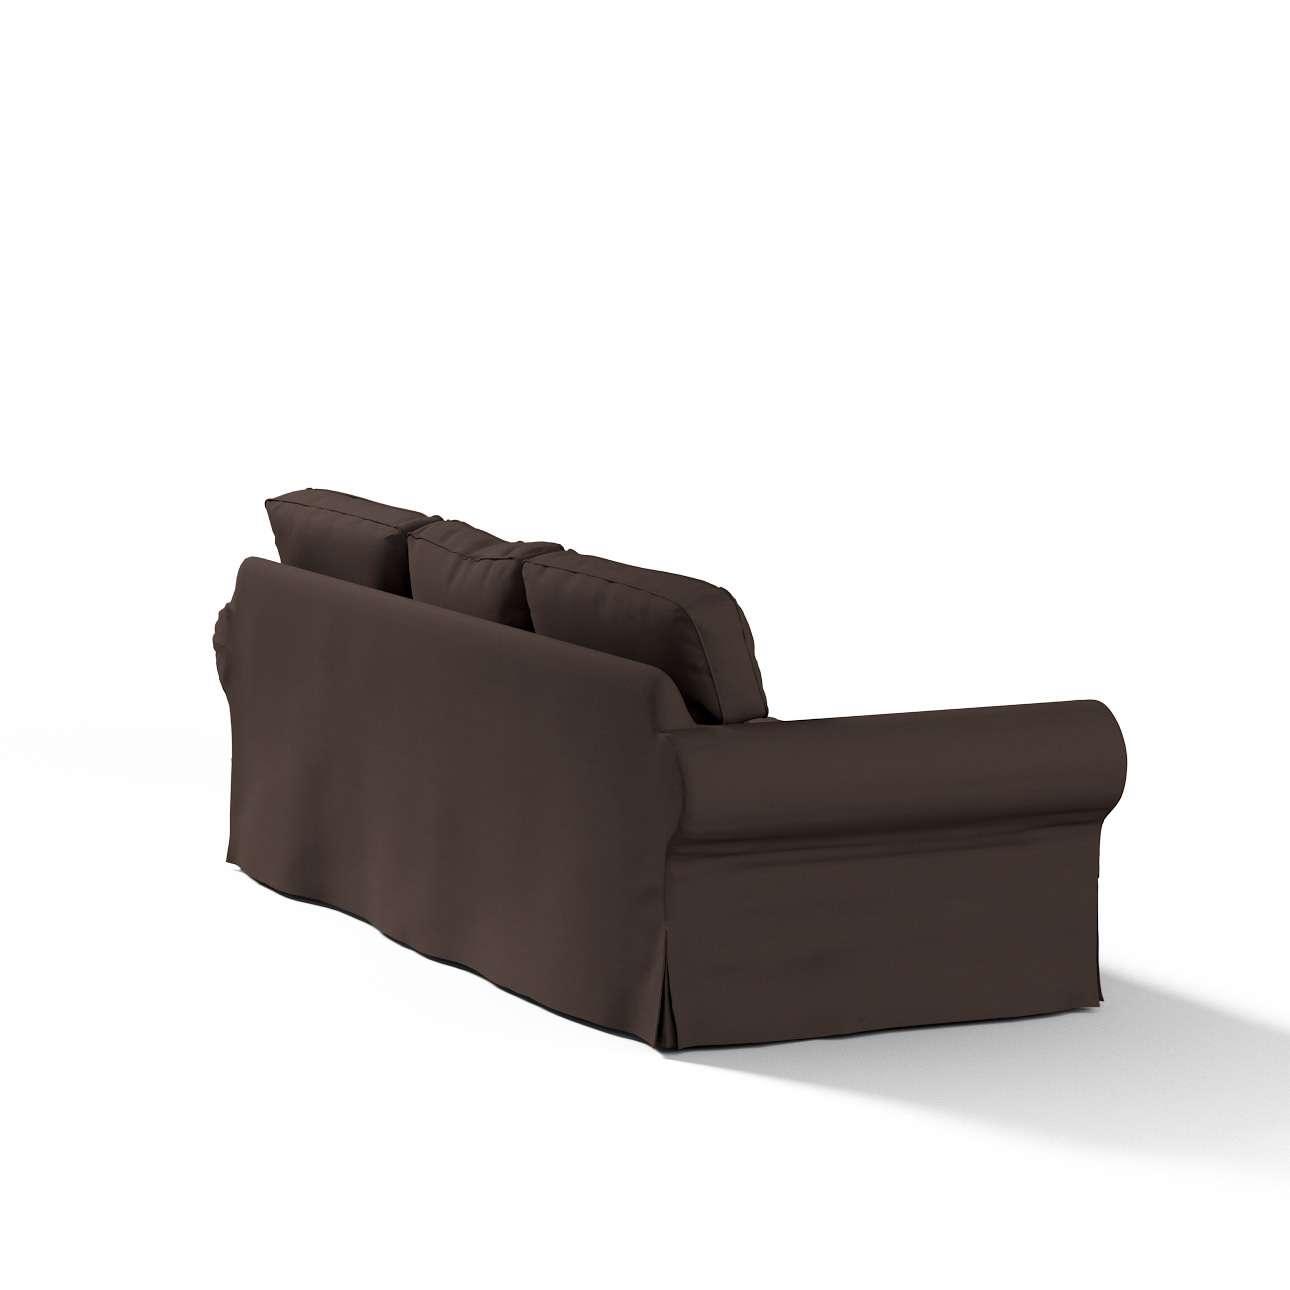 Ektorp 3-Sitzer Schlafsofabezug, ALTES Modell Sofahusse Ektorp 3-Sitzer Schlafsofa von der Kollektion Cotton Panama, Stoff: 702-03